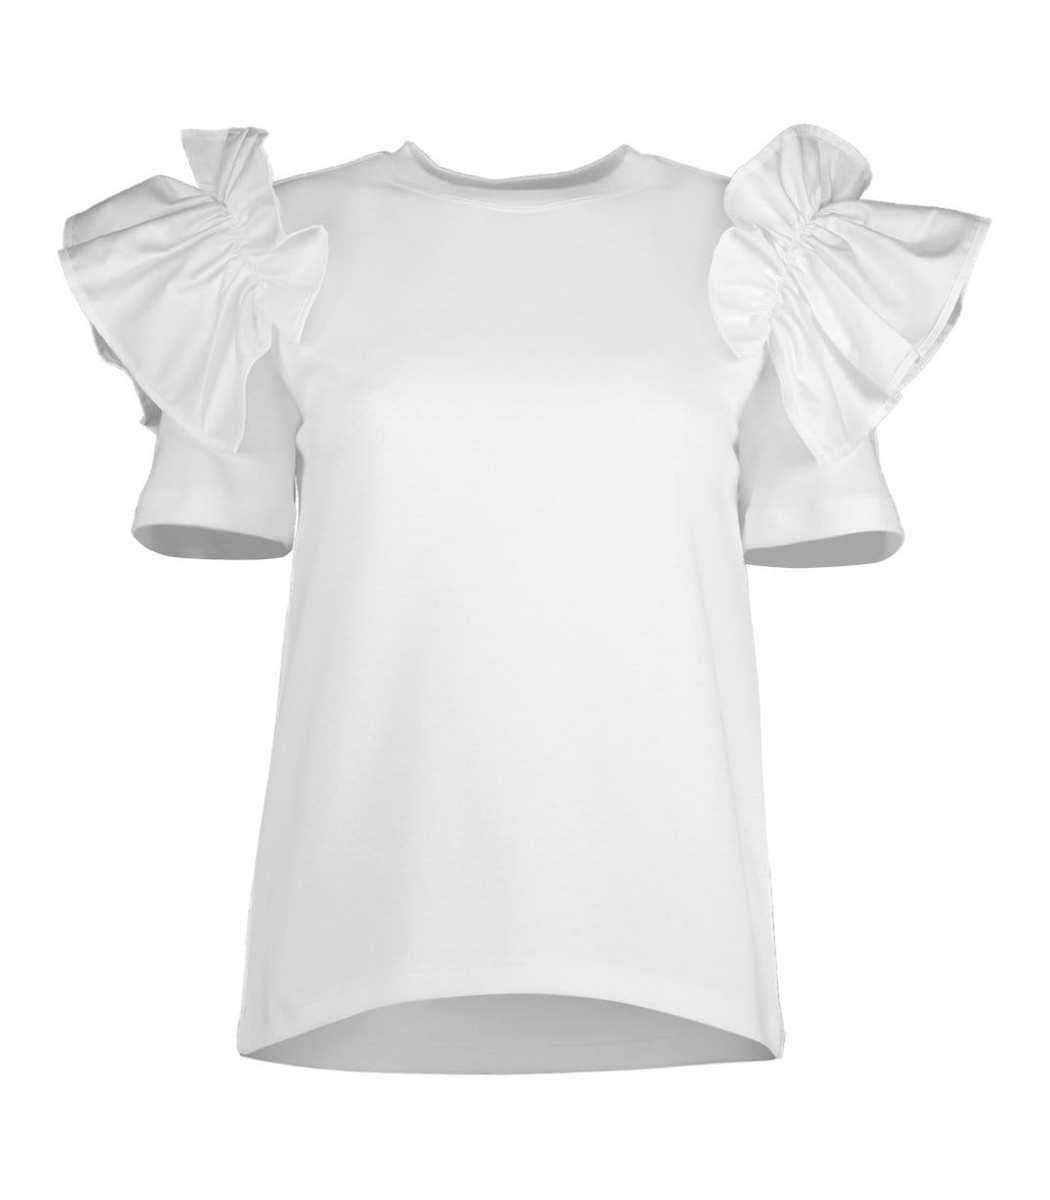 Adeam Short Sleeve Ruffle Tee Shirt